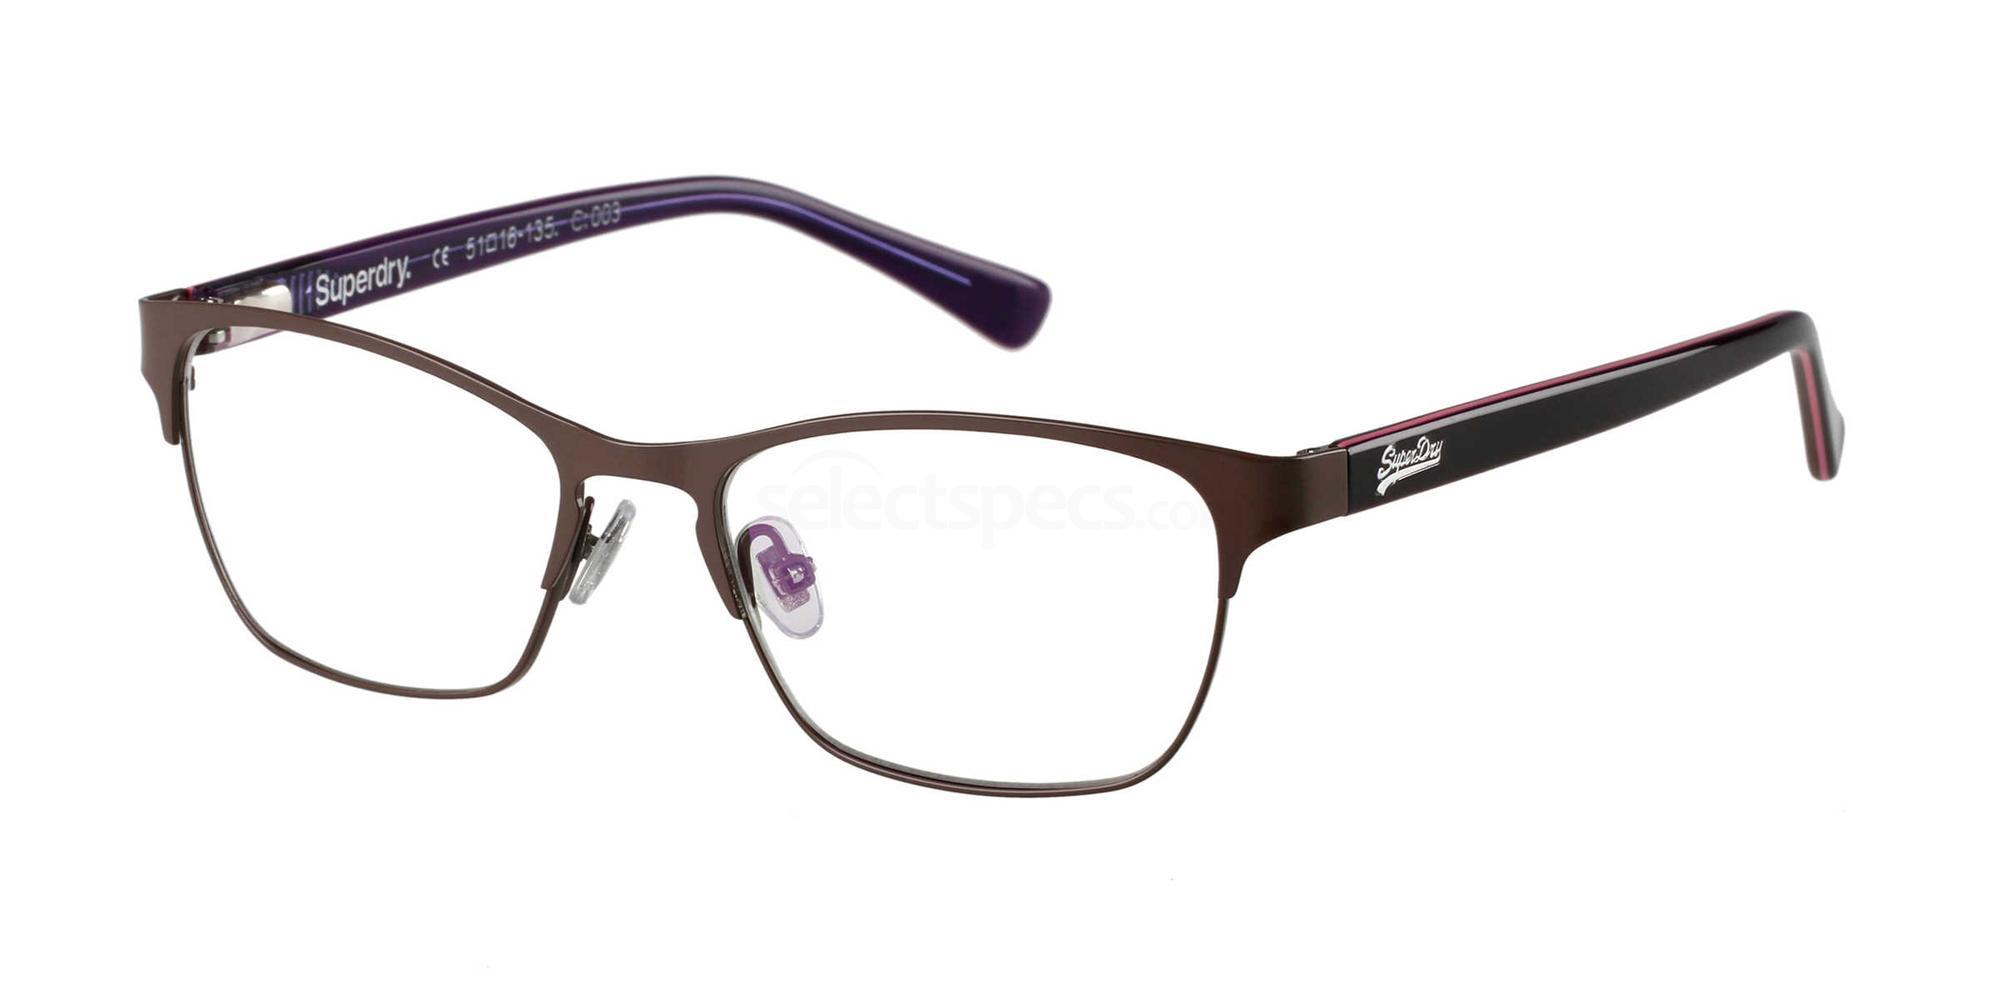 003 SDO-MILA Glasses, Superdry